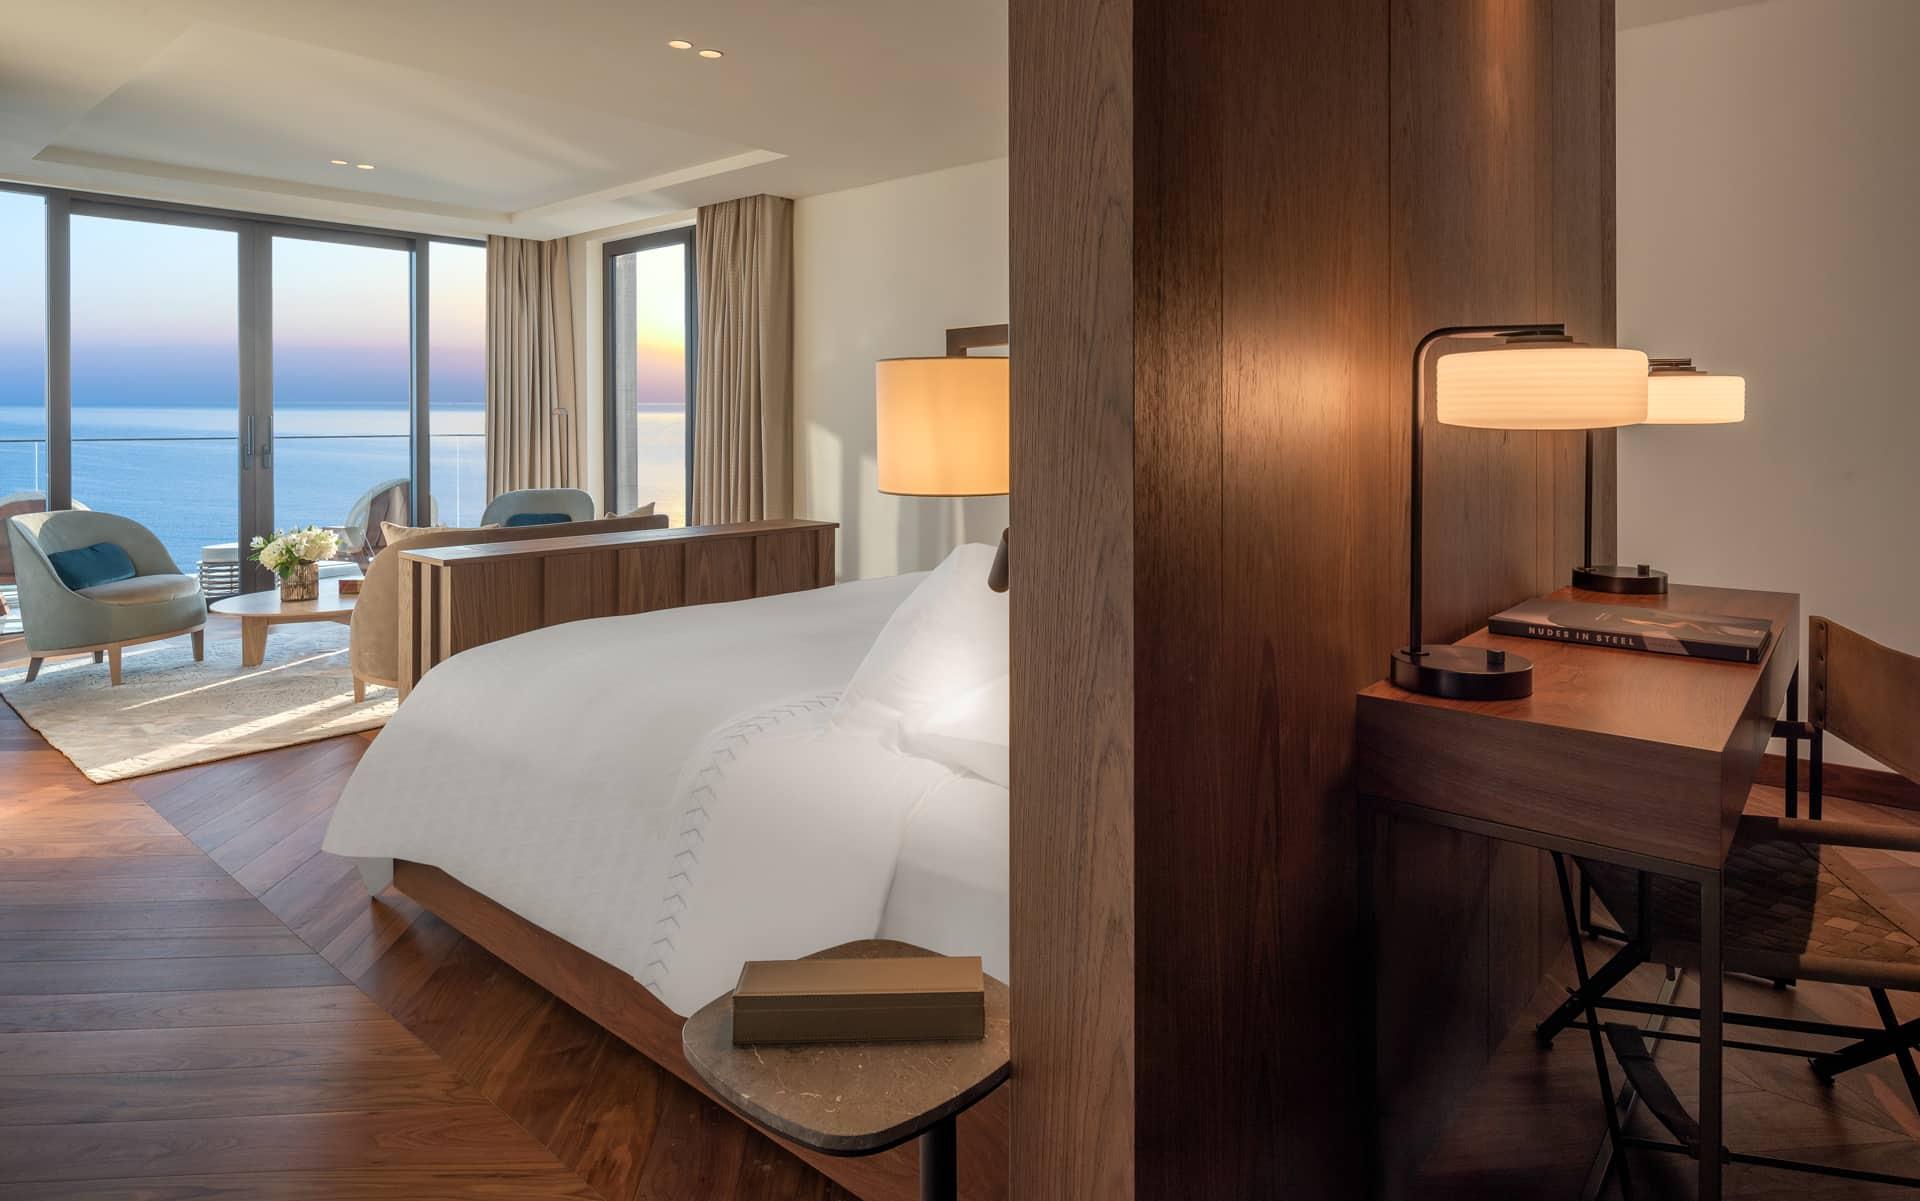 The-Amara-Suite-Bedroom-n°1-1920×1201-s